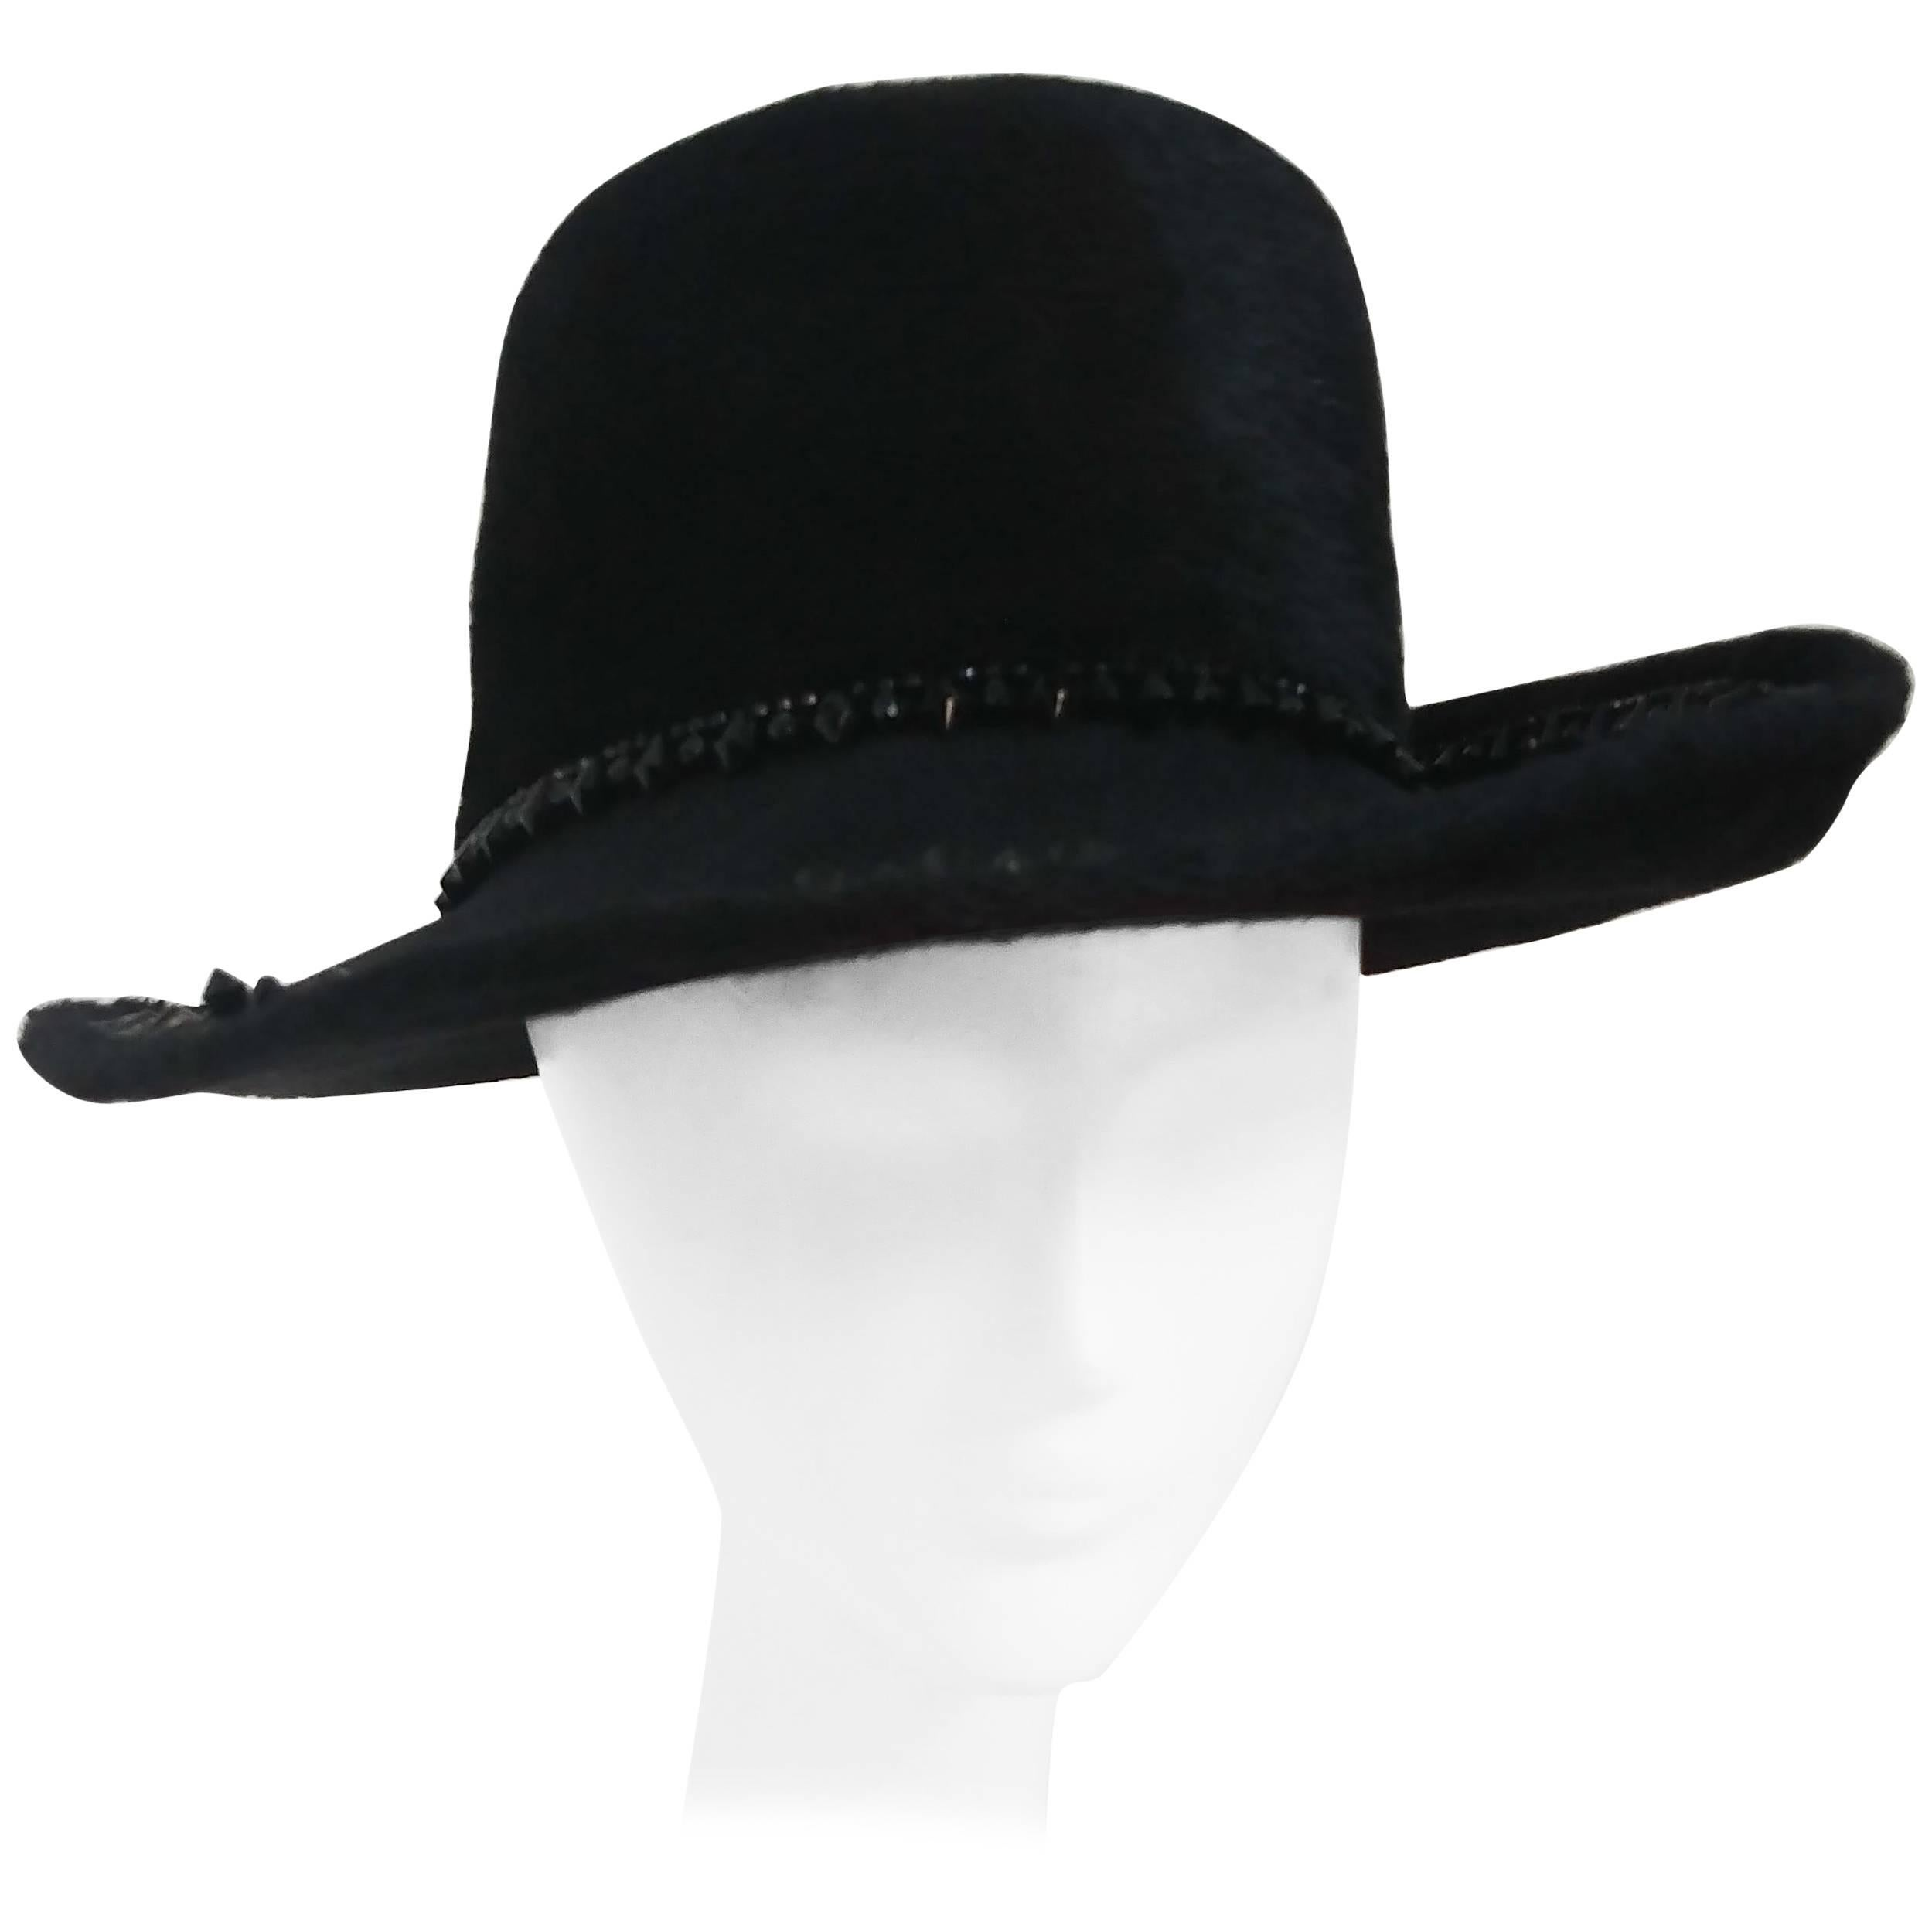 8561b39e22d Fur Hats - 140 For Sale on 1stdibs